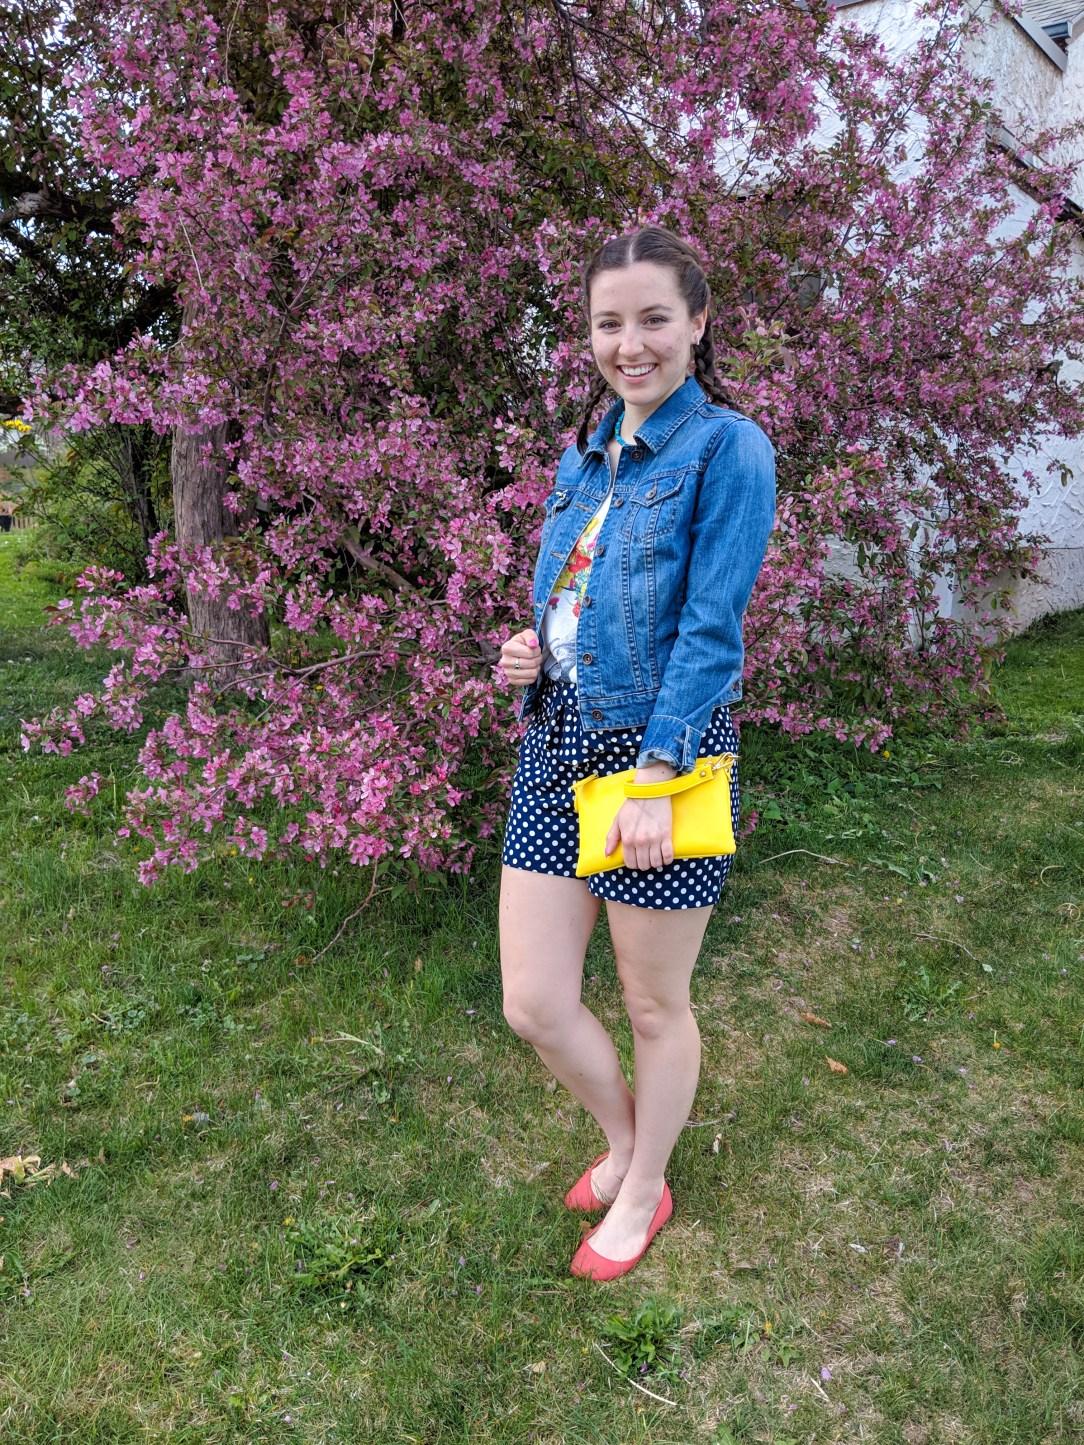 jean jacket, polka dot shorts, yellow purse, orange flats, spring outfit